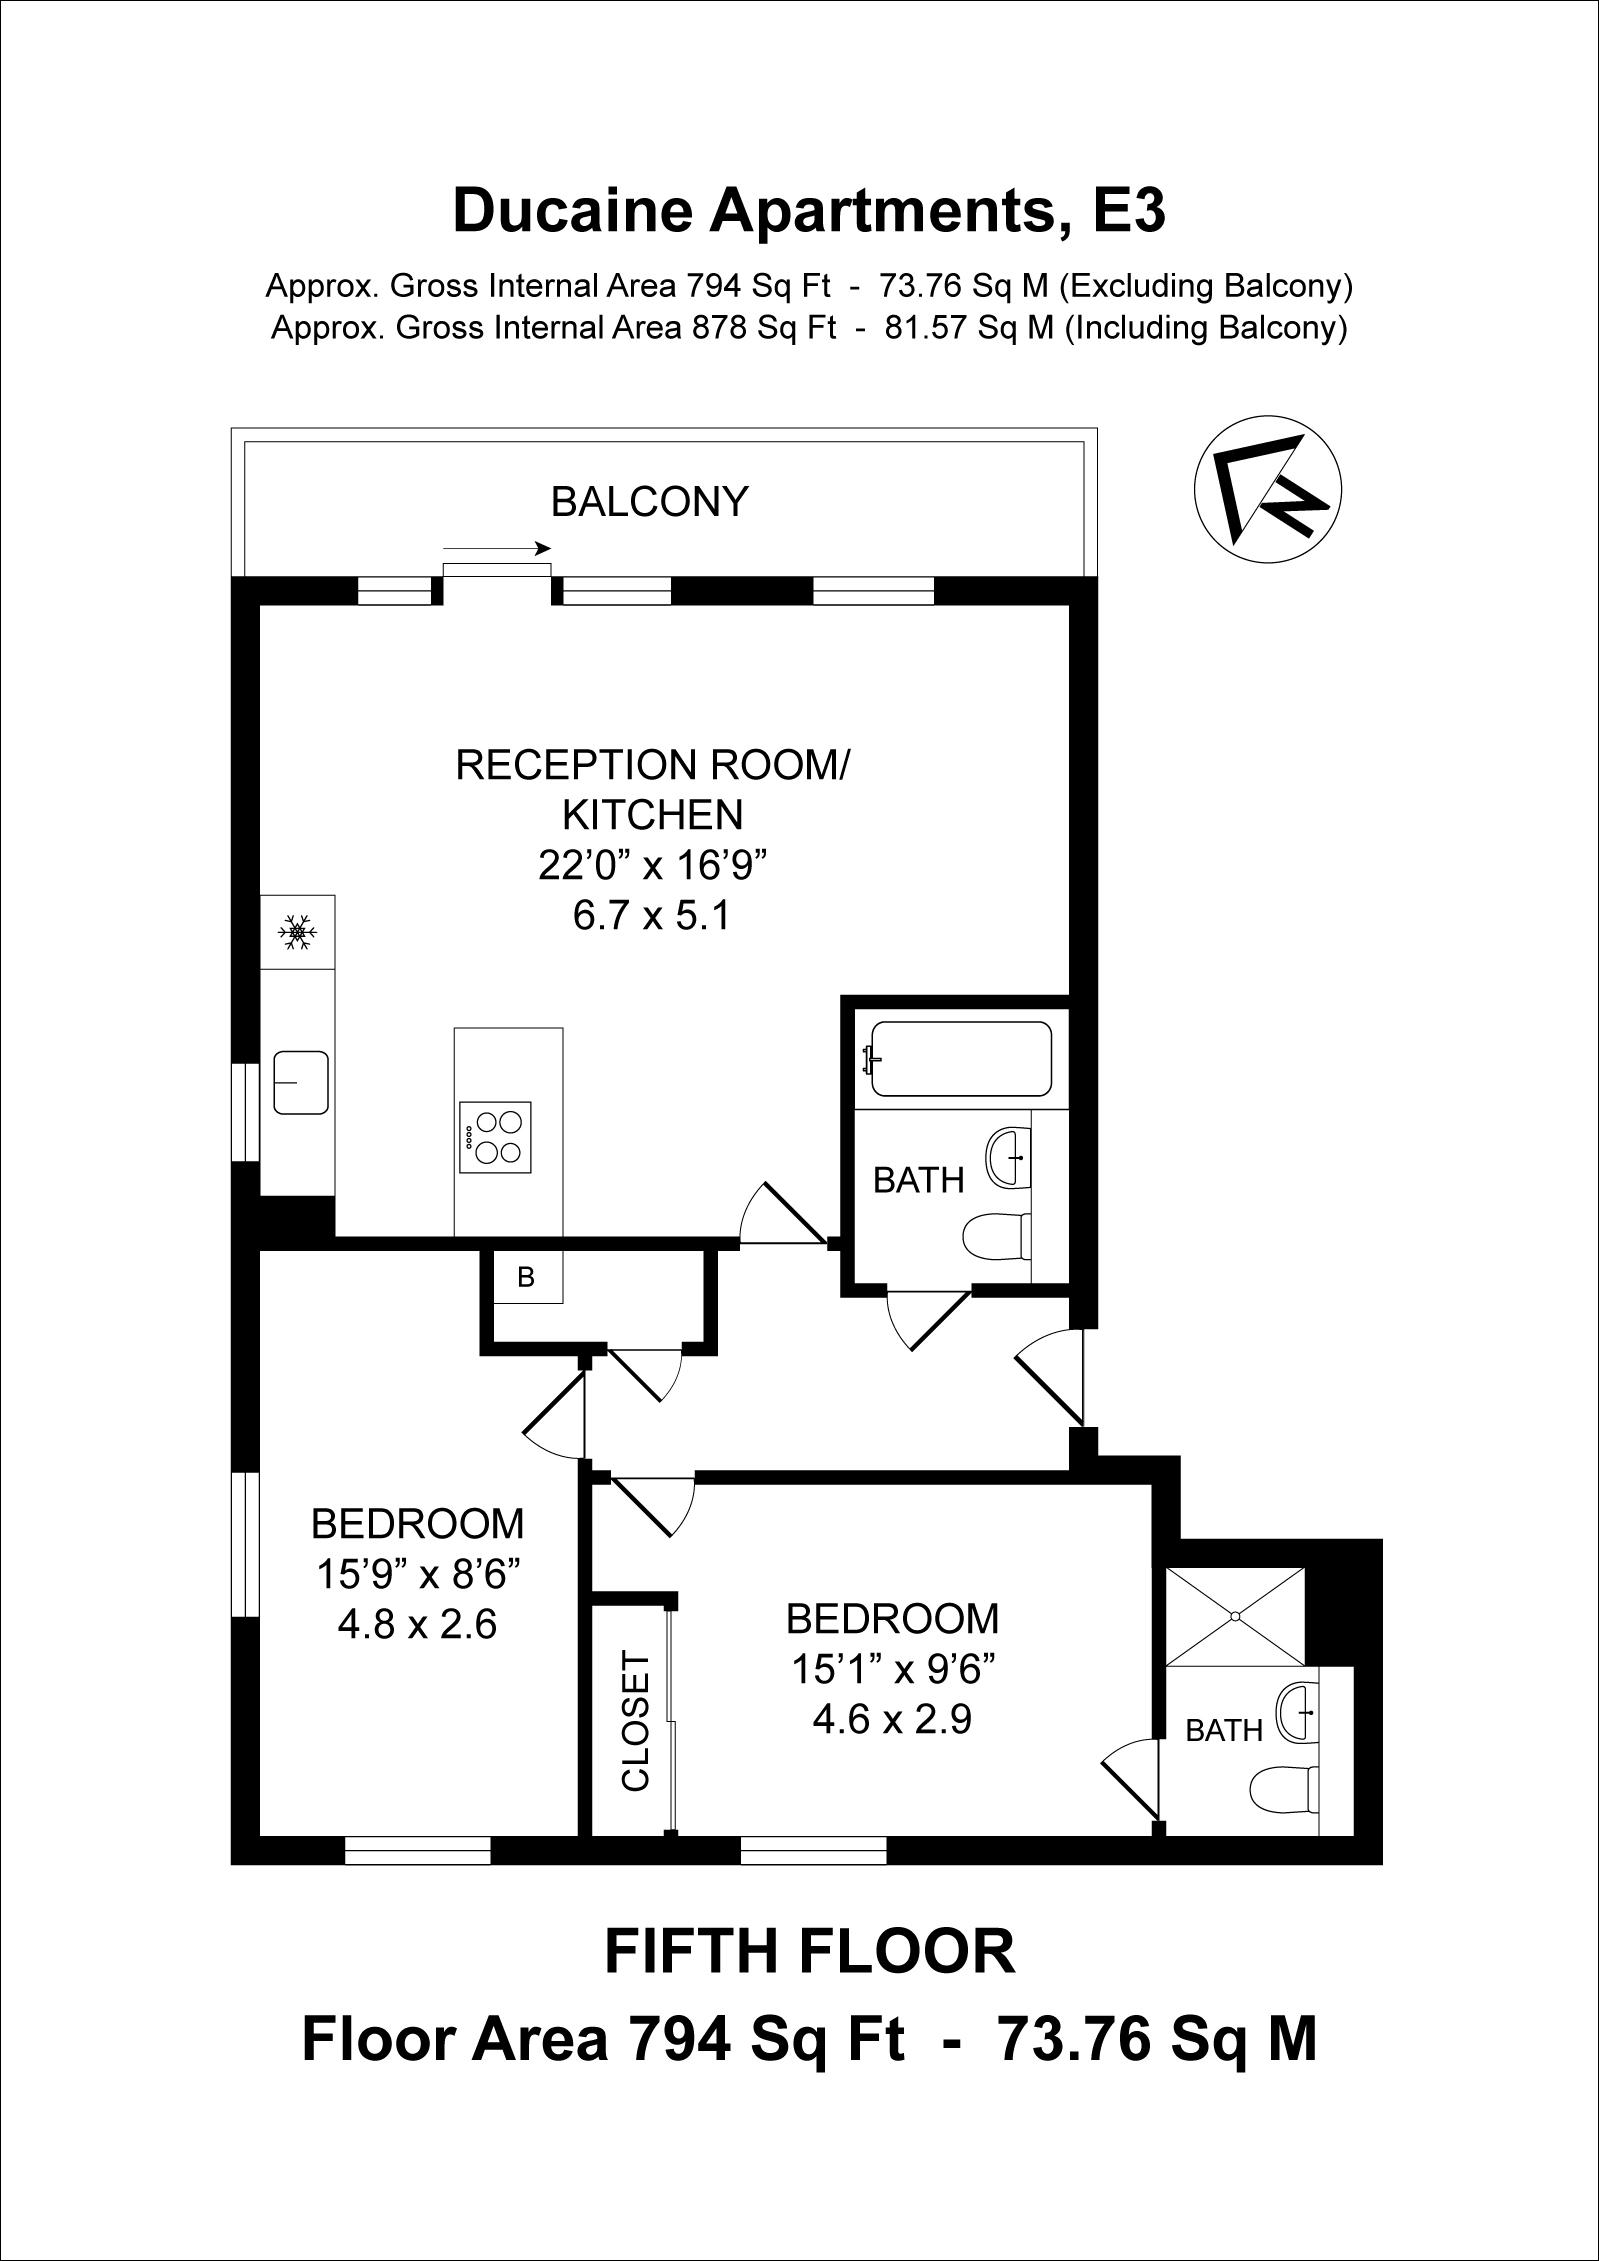 floorplan-penthouse-apartment-bow-e3-for-sale-7